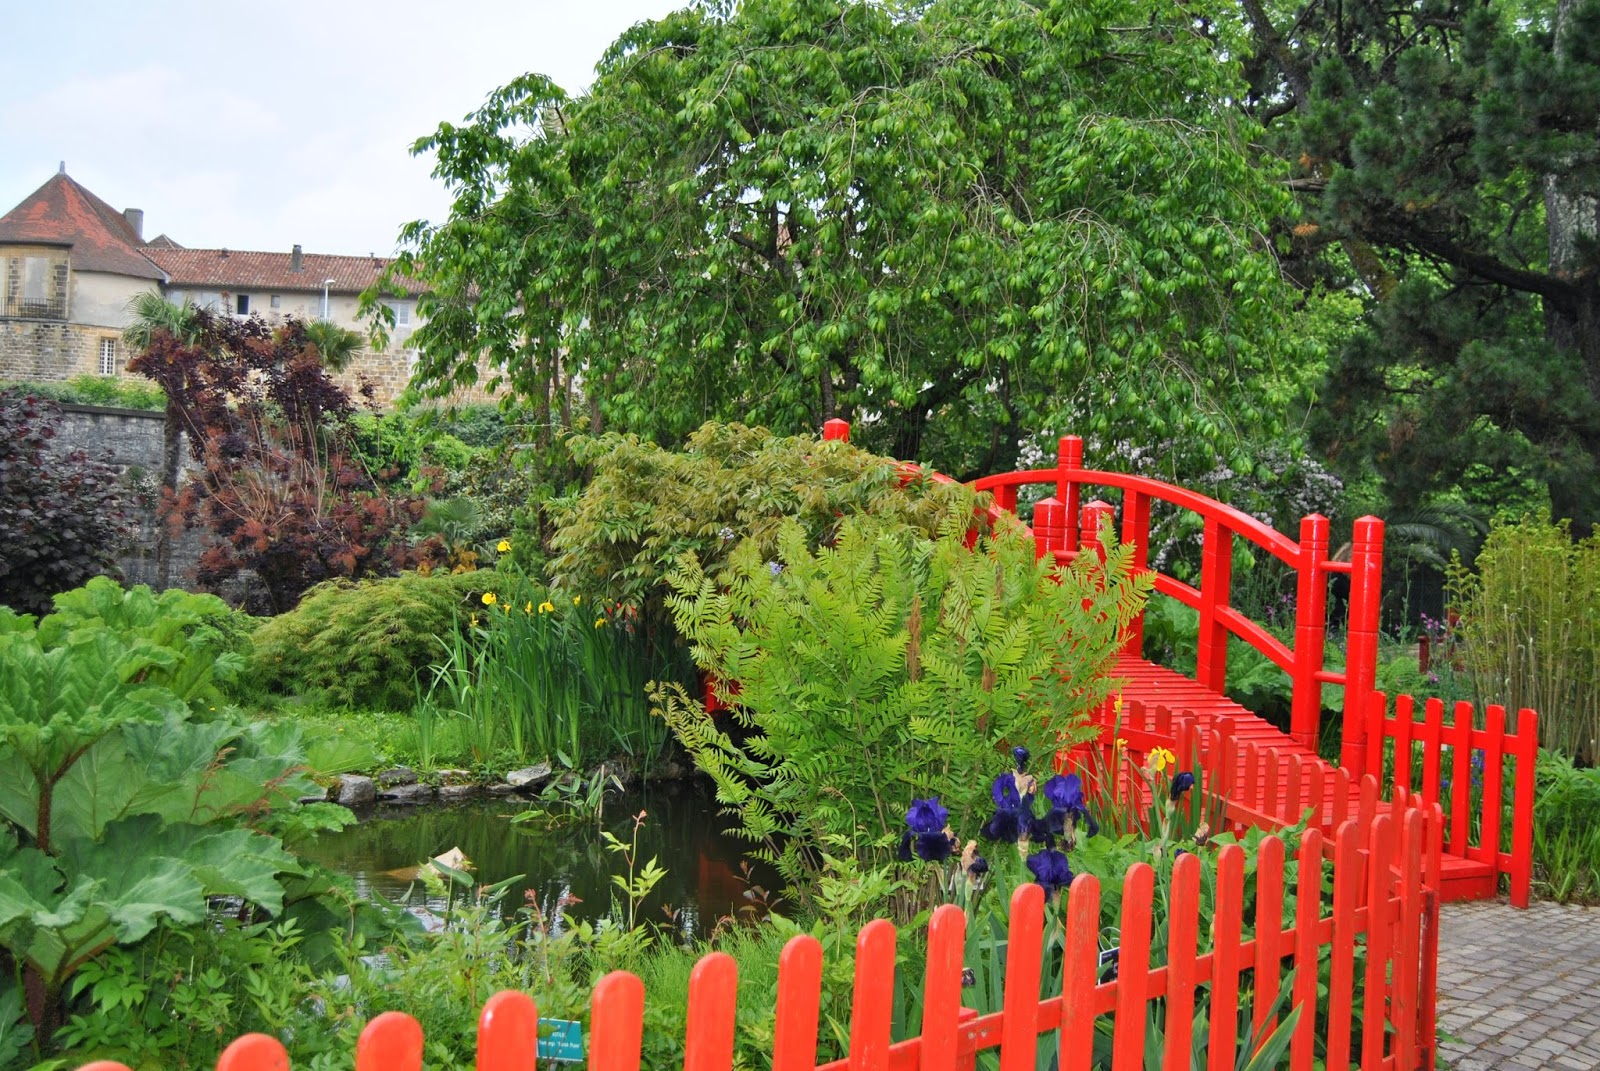 Le journal du cdi for Entretien jardin bayonne